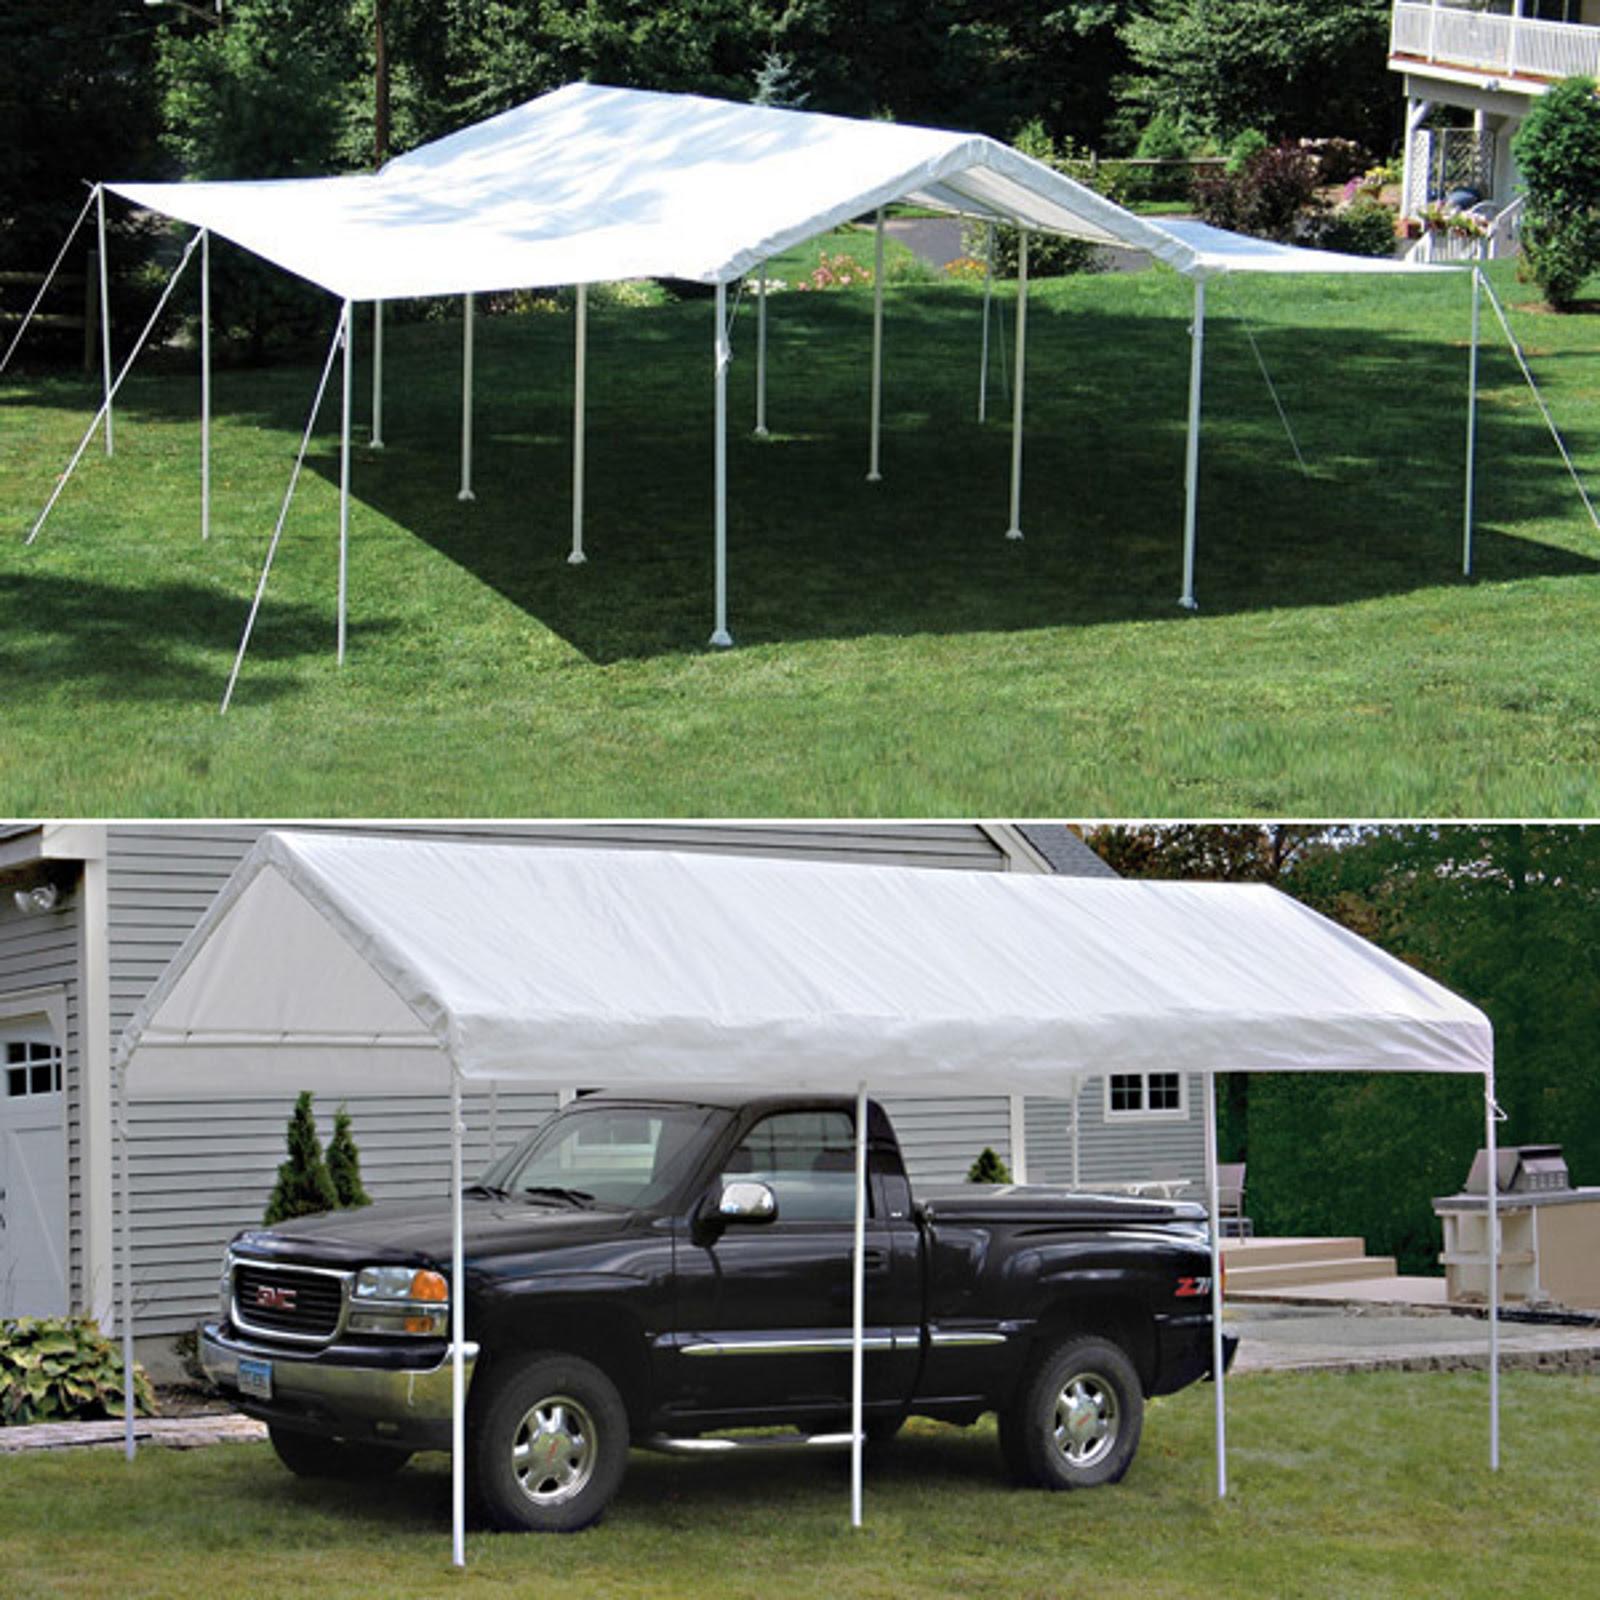 ShelterLogic Max AP Canopy 10' x 20' 2-in-1 Packs ...